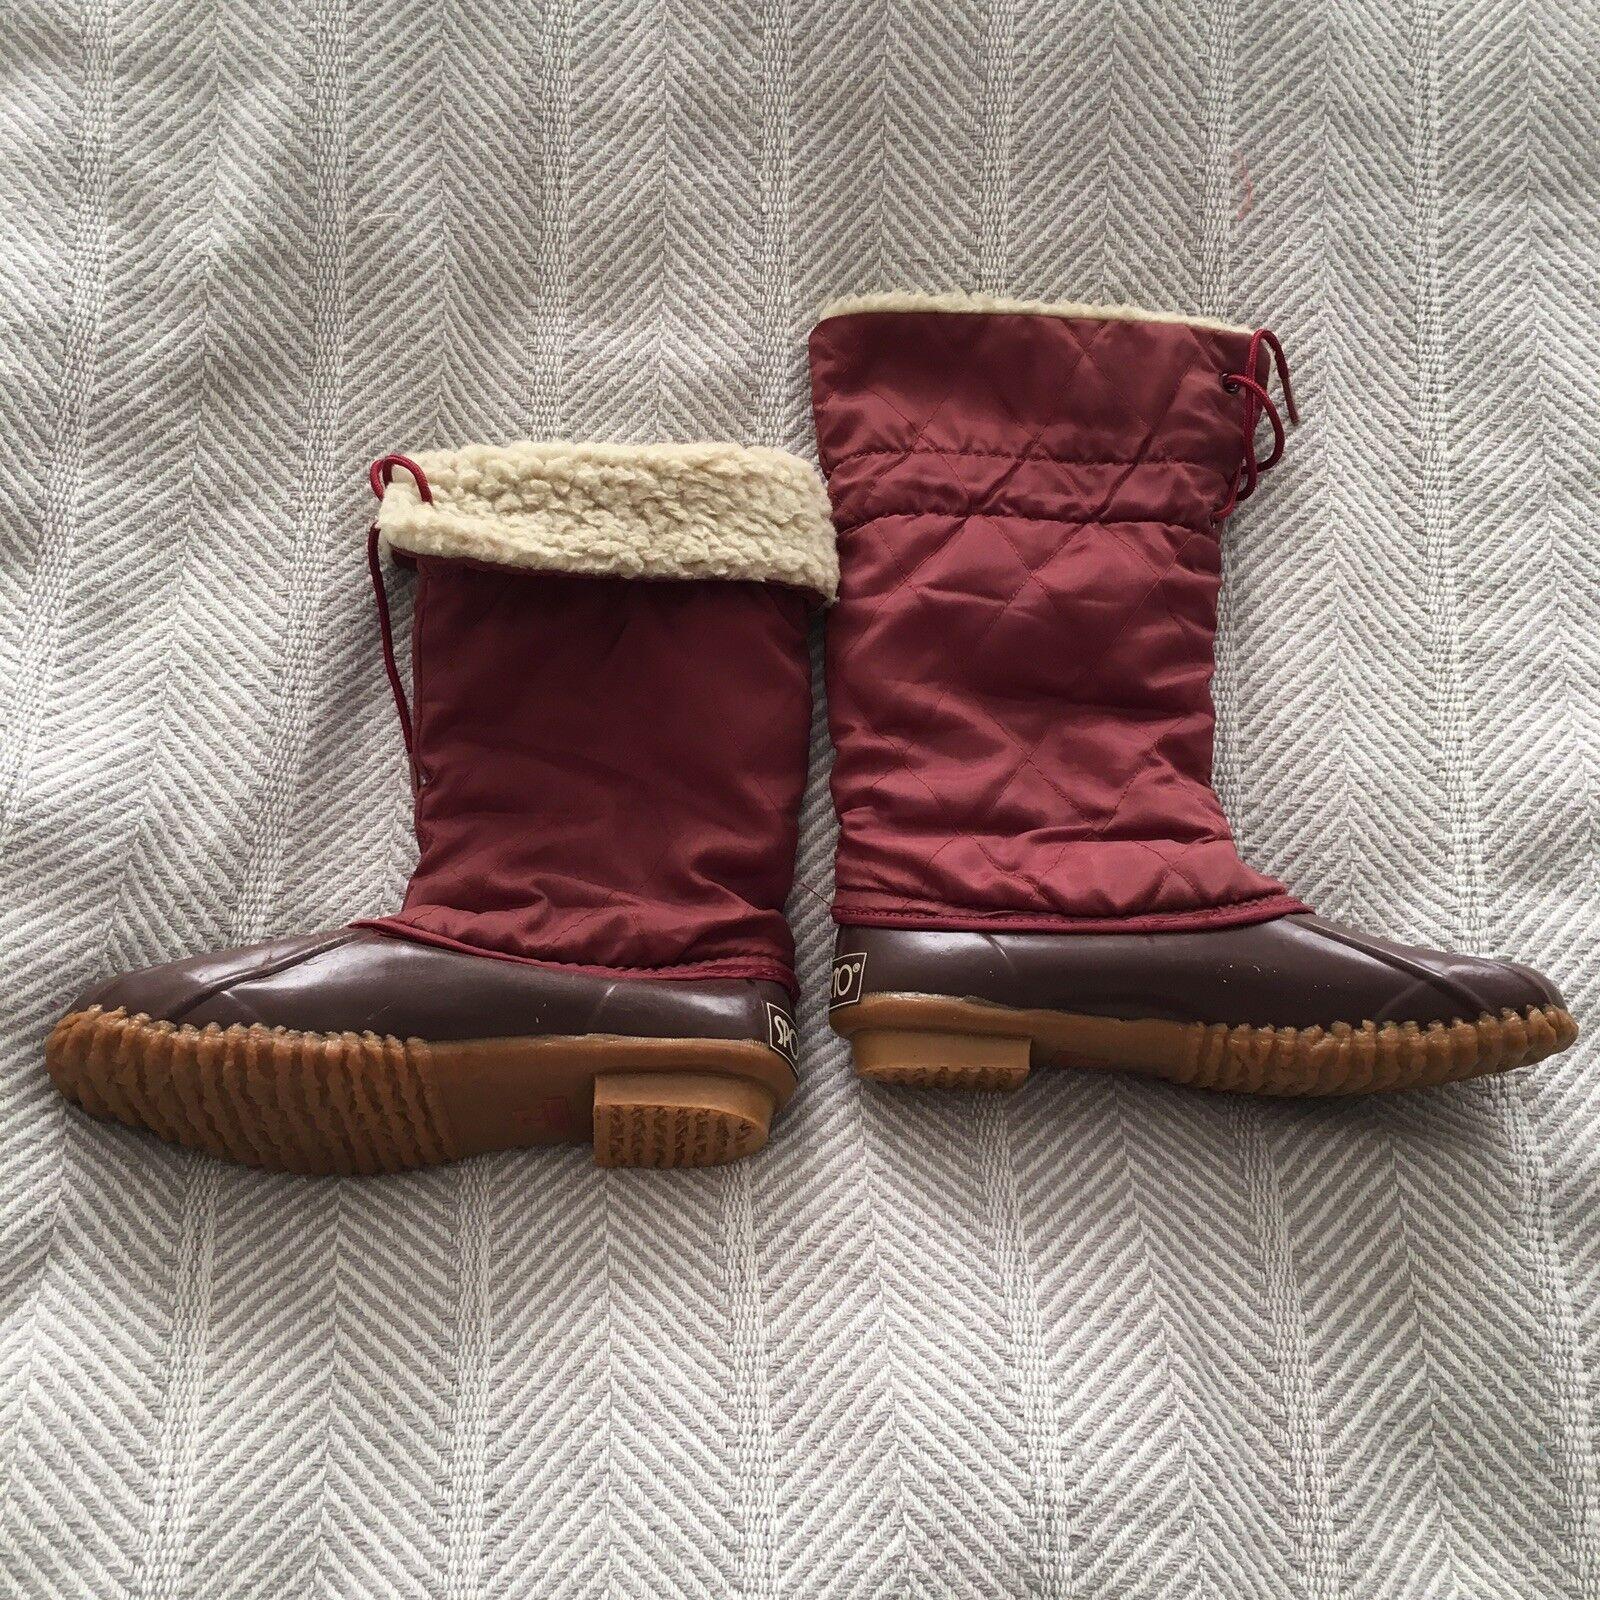 Vintage Sporto Quilted Fleece Lined Tall Duck bottes Sz 7 Korea EUC